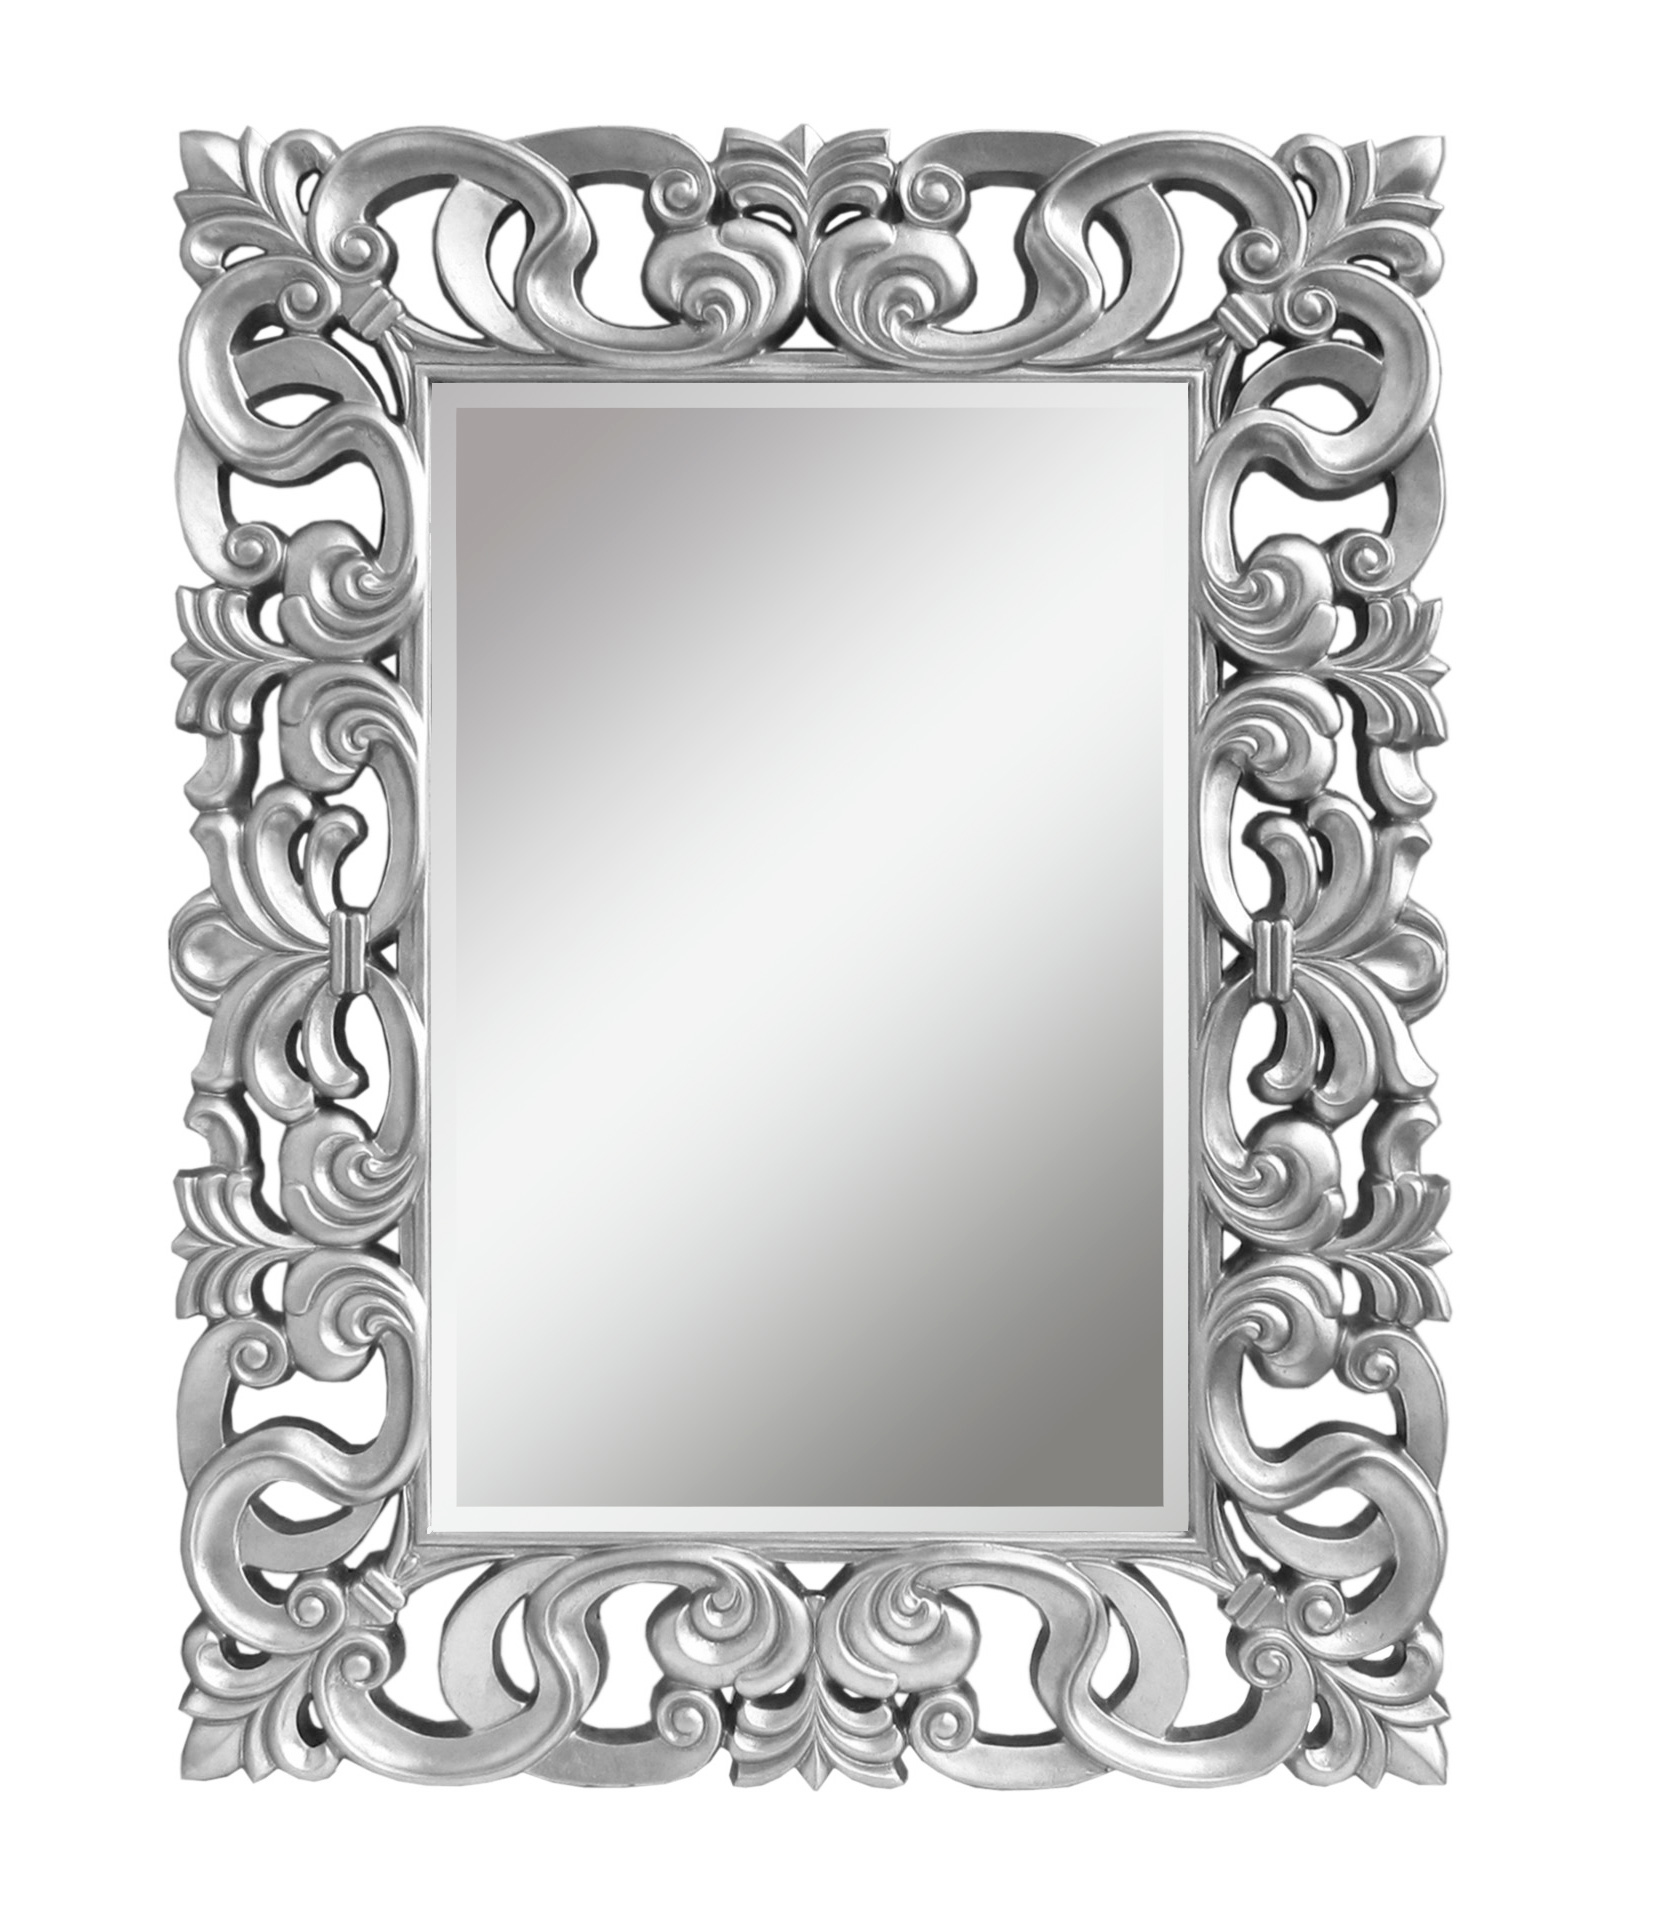 Заказать зеркало в багете в Минске